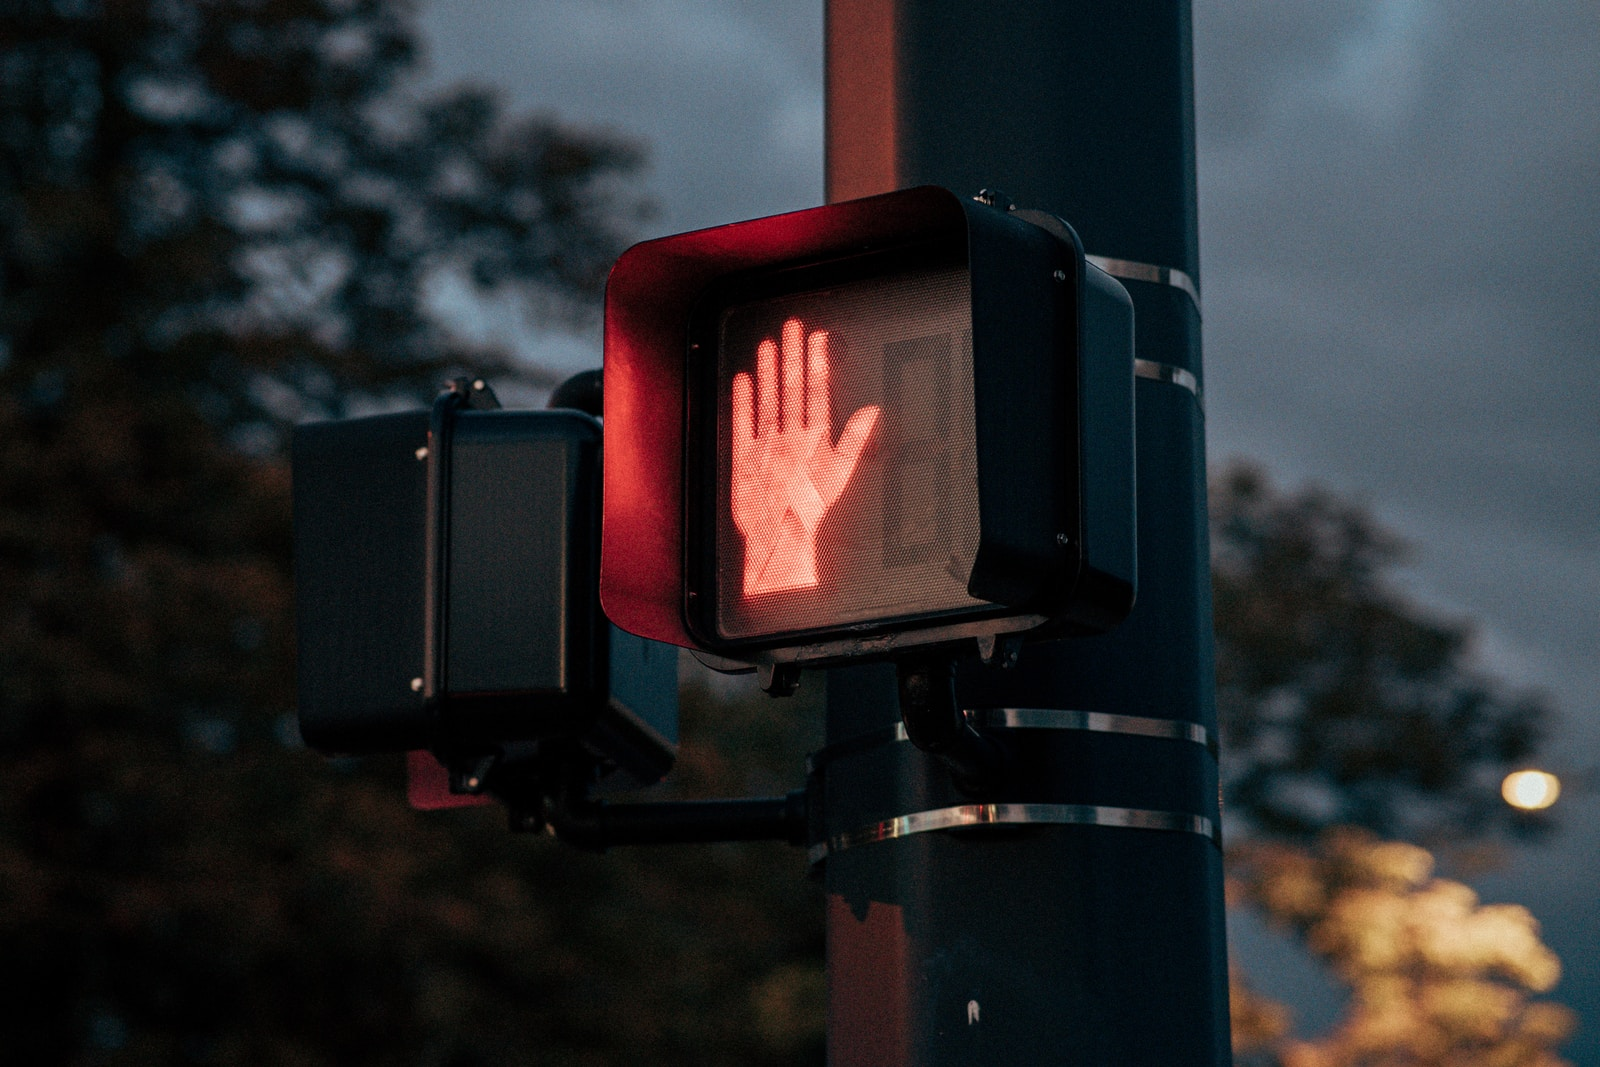 black traffic light with red light